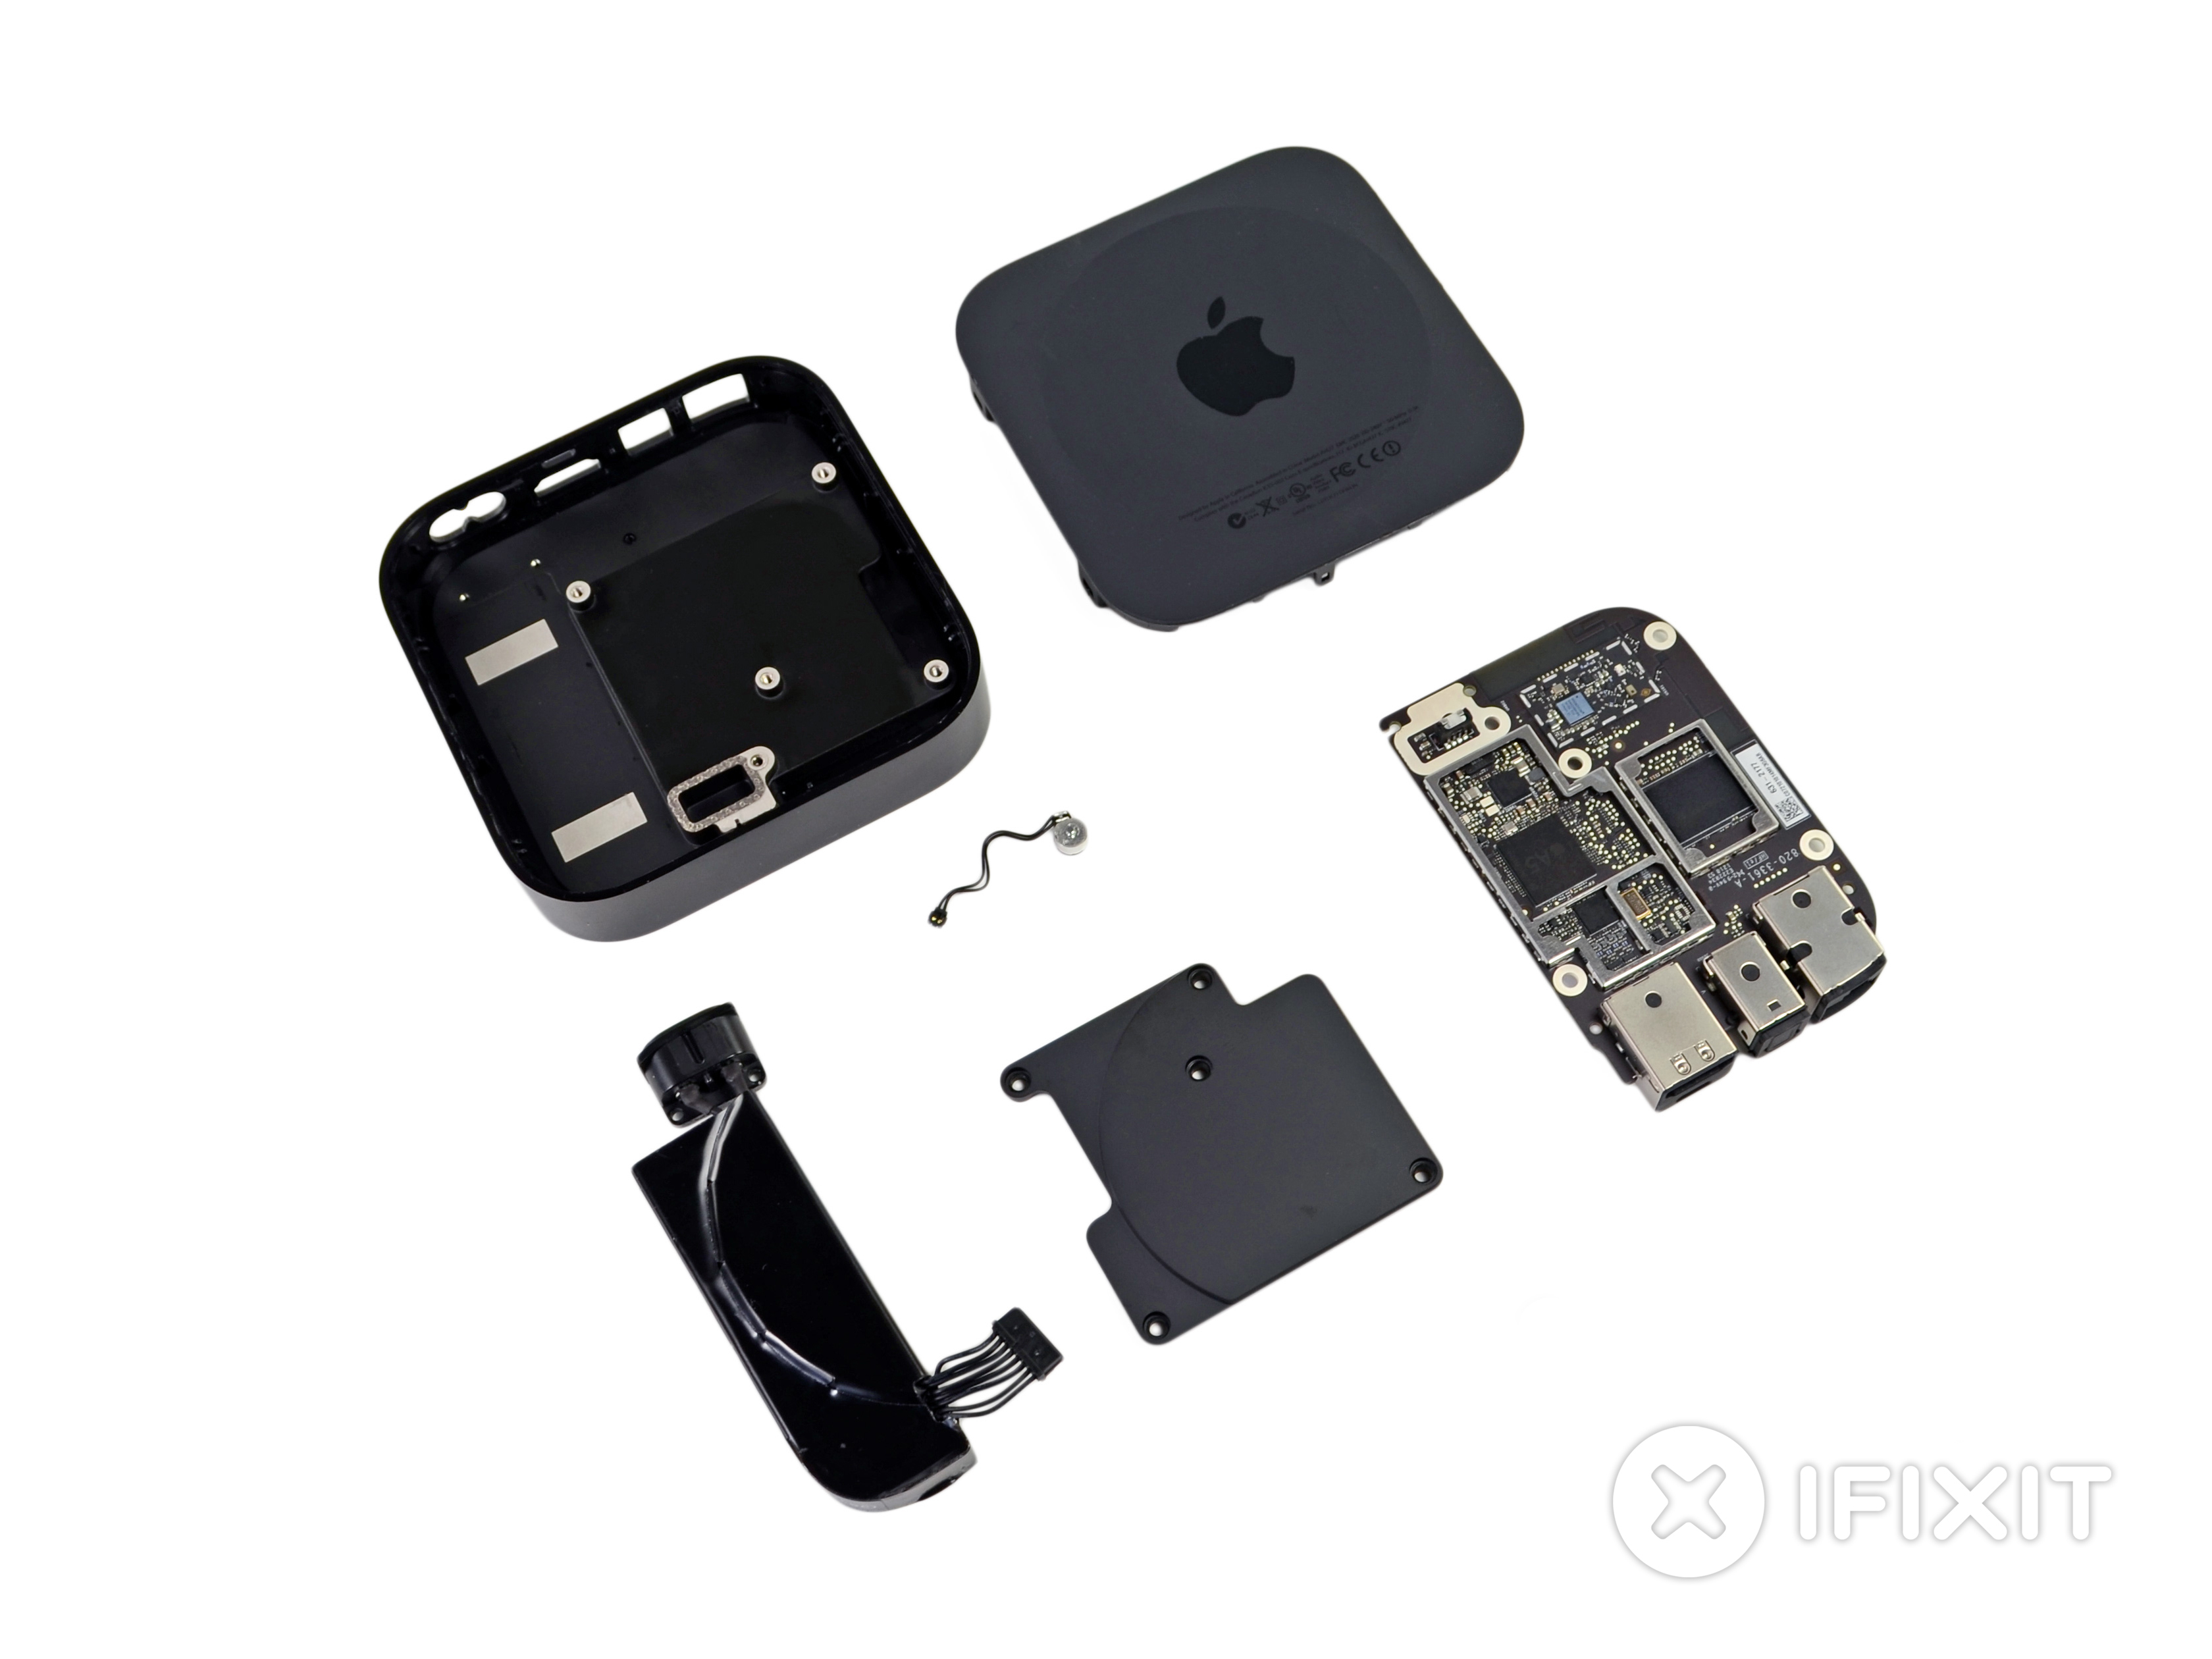 apple tv 3rd generation teardown ifixit rh ifixit com Apple TV Manual PDF Apple TV Manual PDF